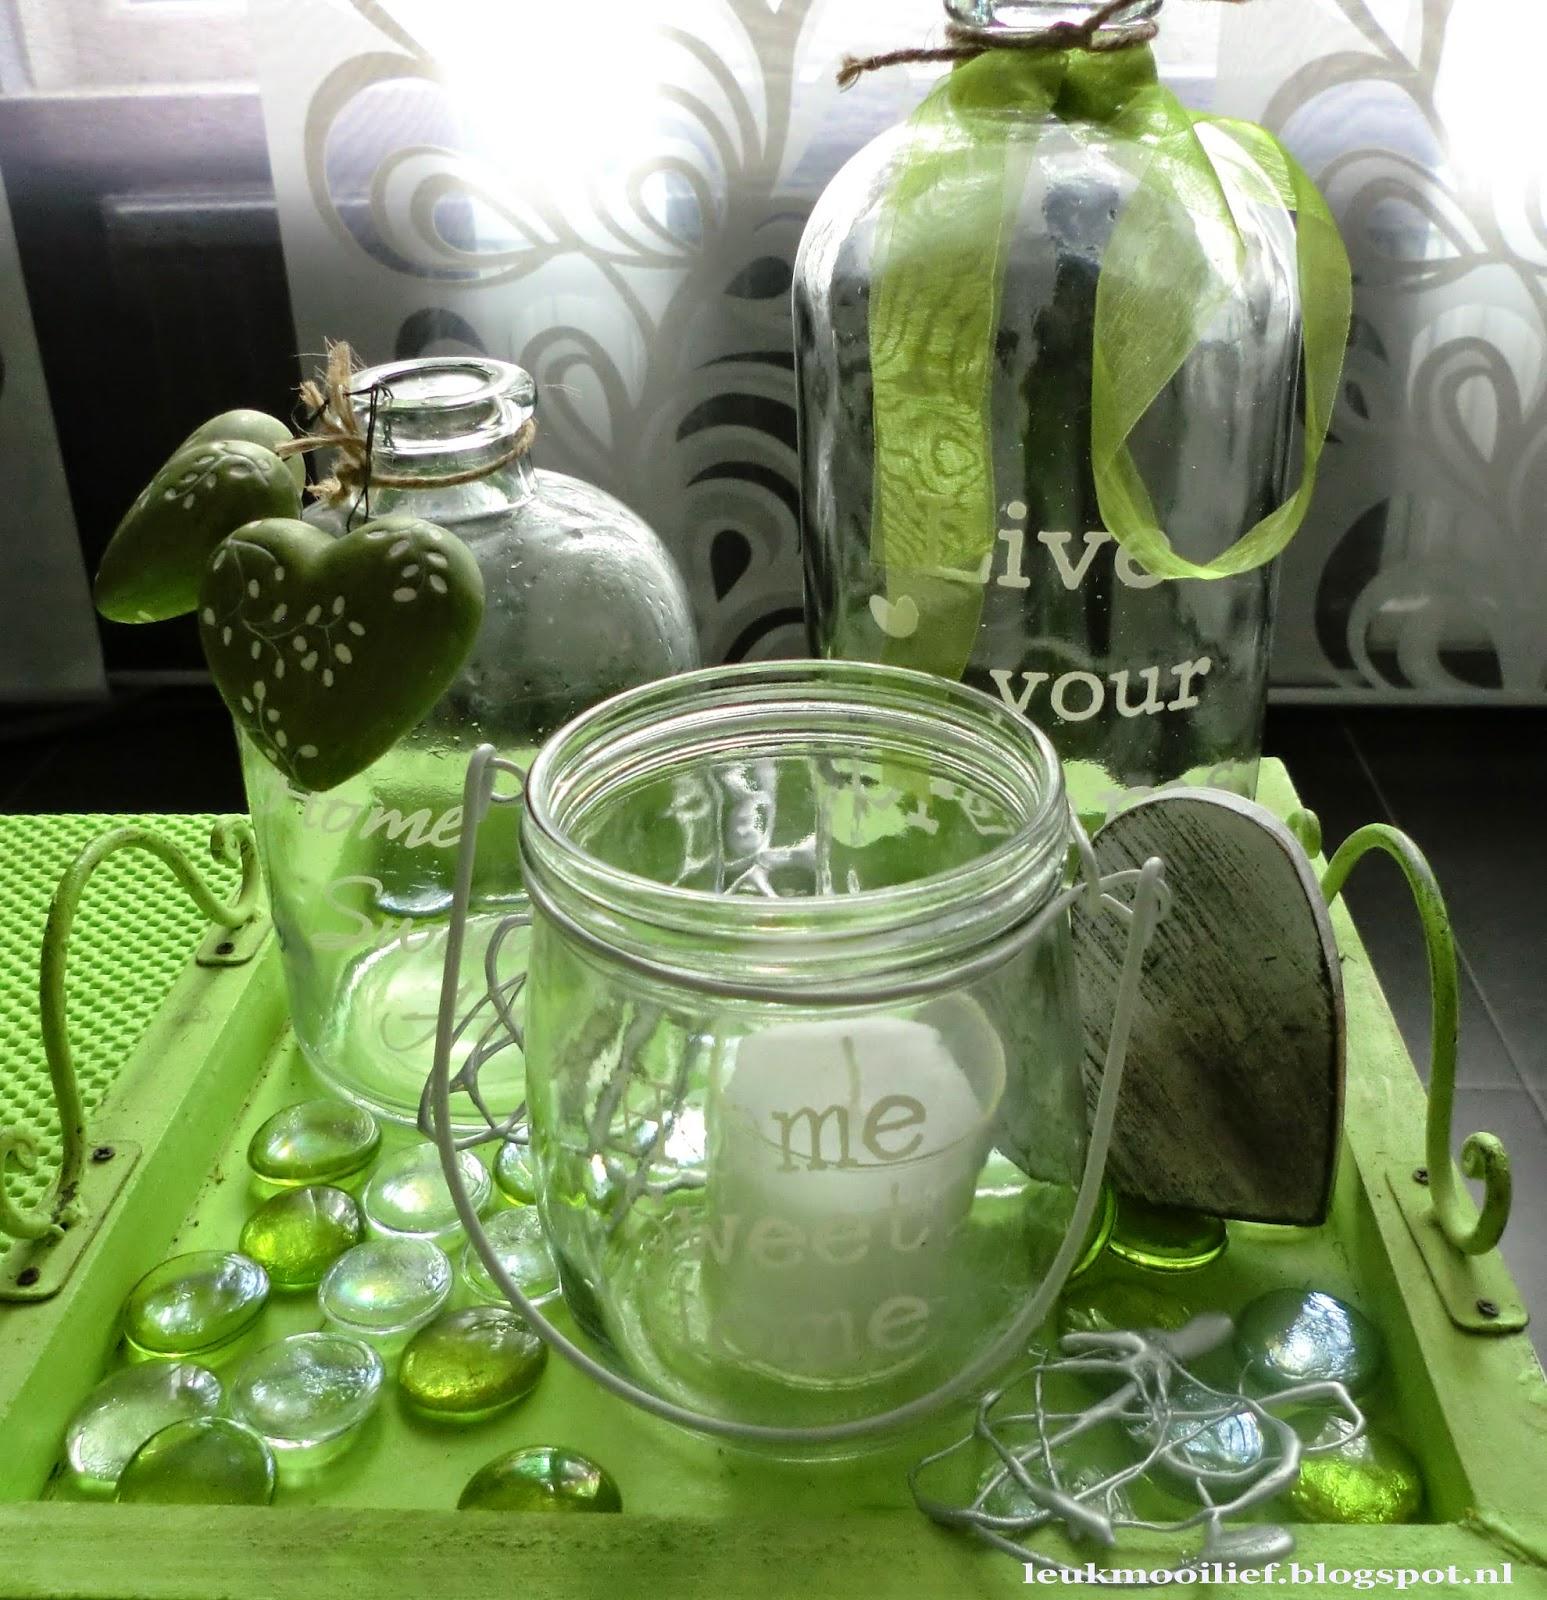 Leuk mooi lief decoratie variatie - Decoratie epuree salon ...